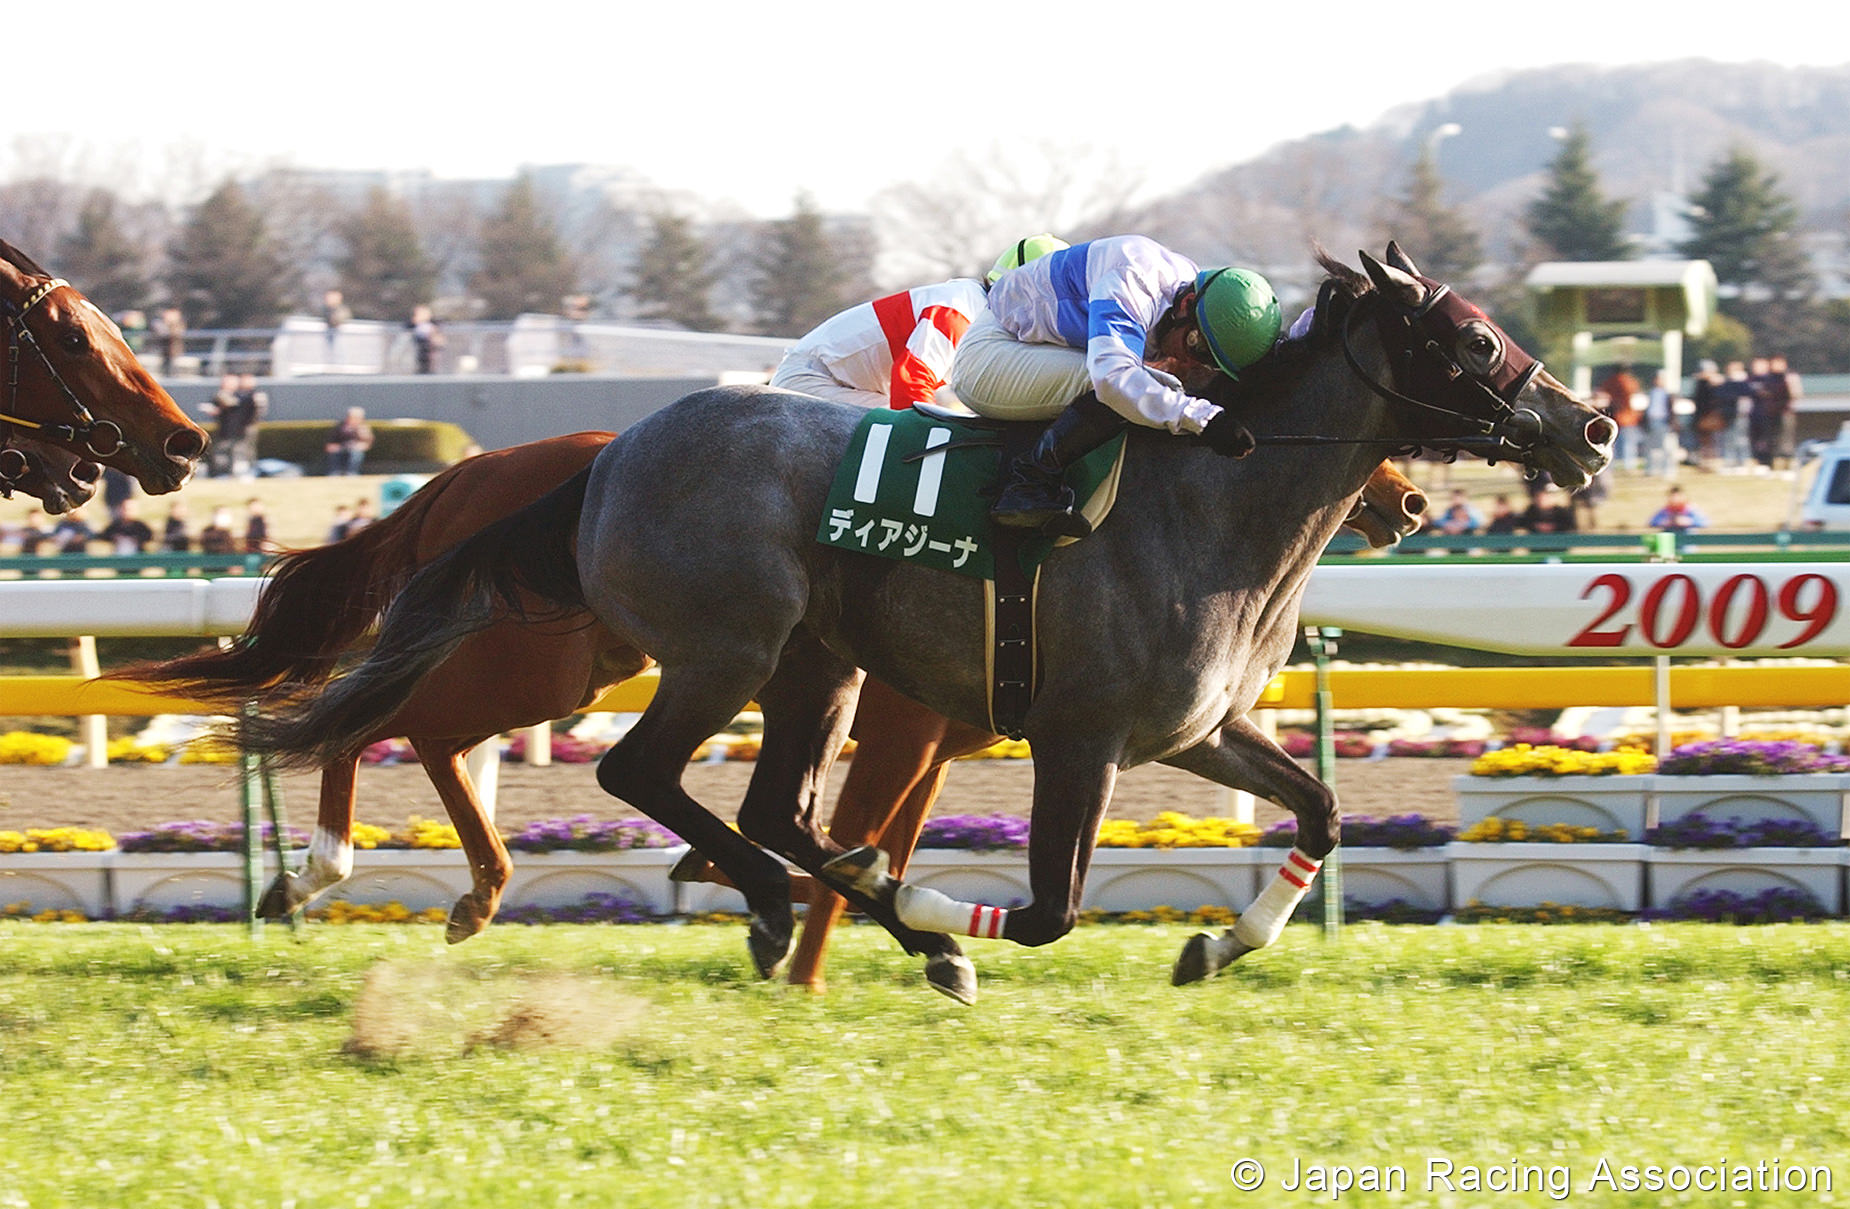 [RACE REPORT]ディアジーナ、クイーンC(GIII)。メジロルマン、未勝利戦 © JRA